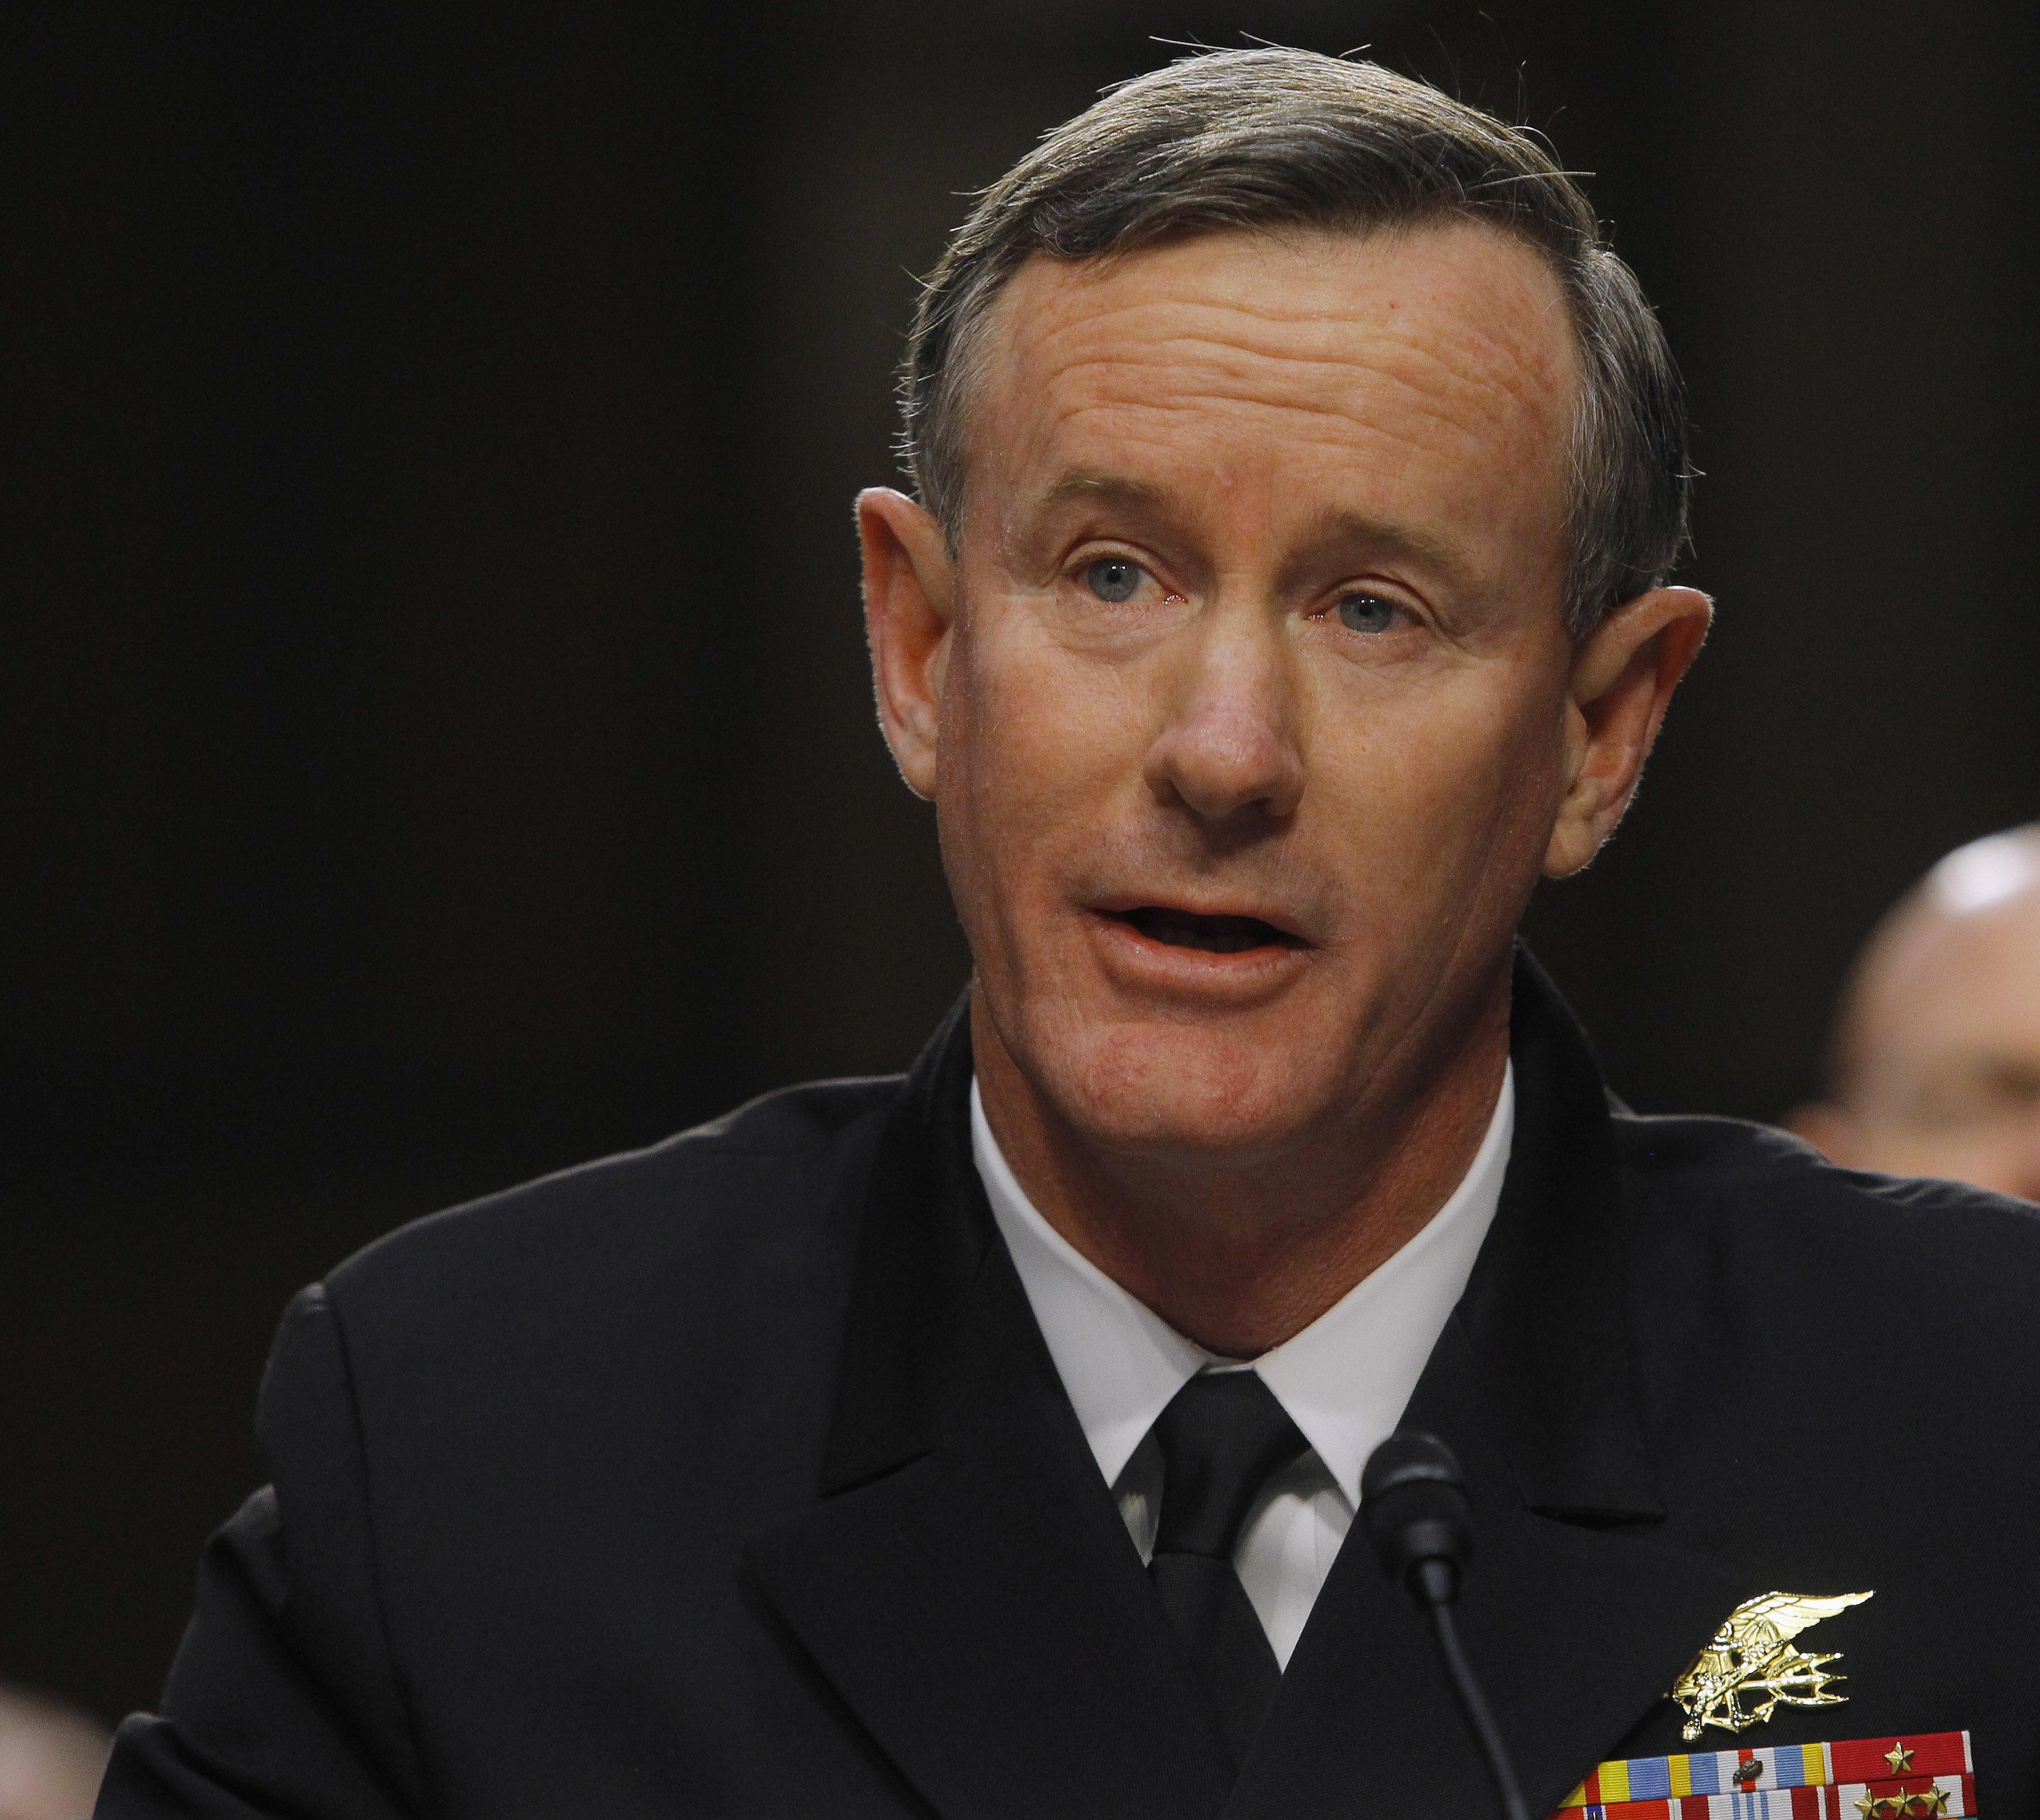 Bin Laden Hunter Slams Trump Behavior As 'Greatest Threat To Our Democracy'